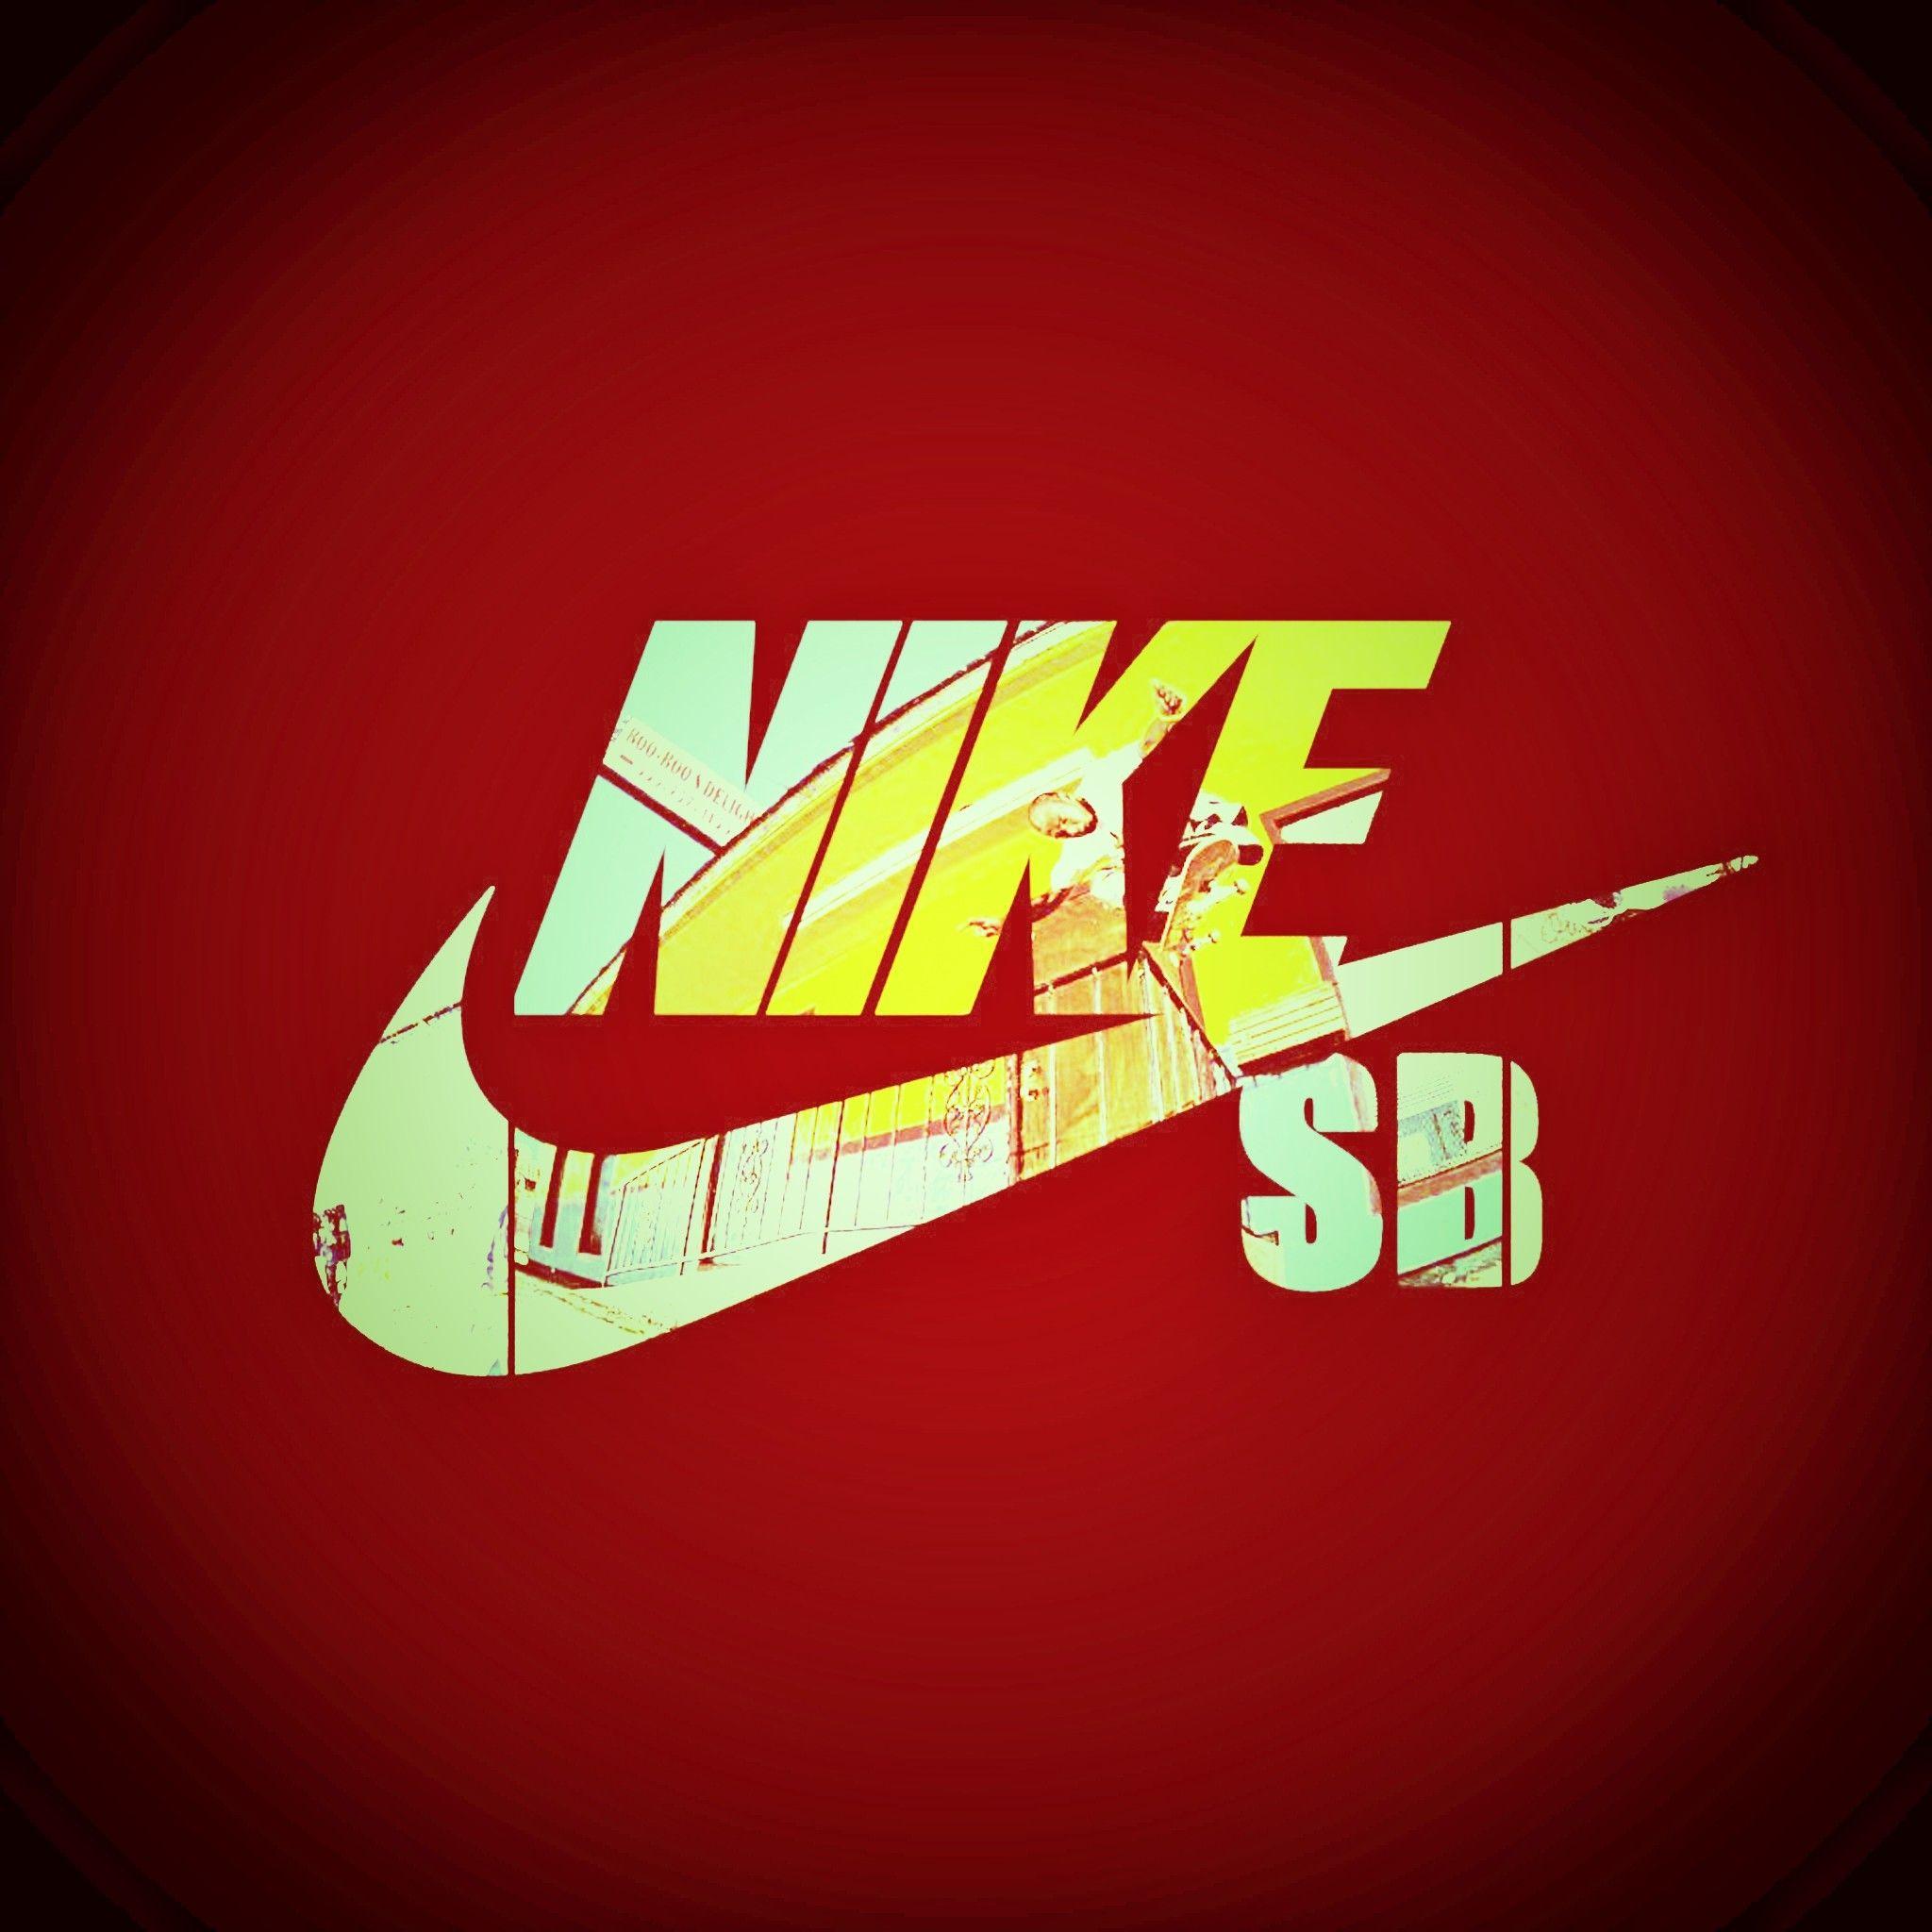 2048x2048 Nike Sb Wallpaper By Jnusjnus On Deviantart Nike